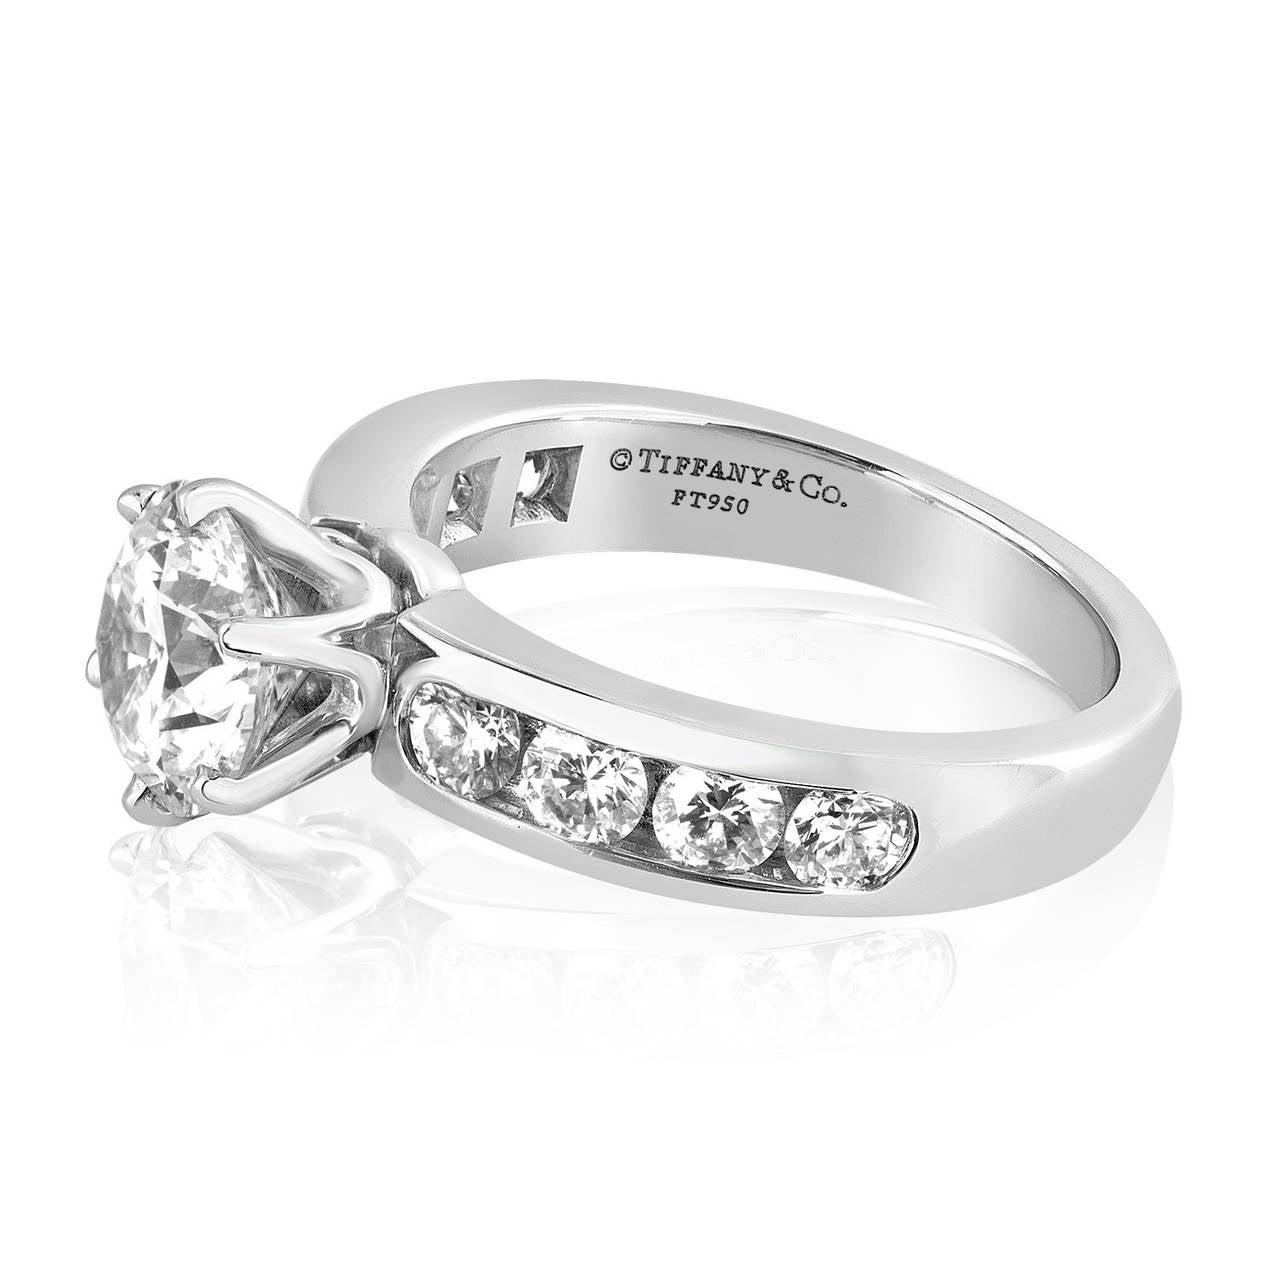 Tiffany & Co. 1.71 Carat F IF Diamond Platinum Ring 3